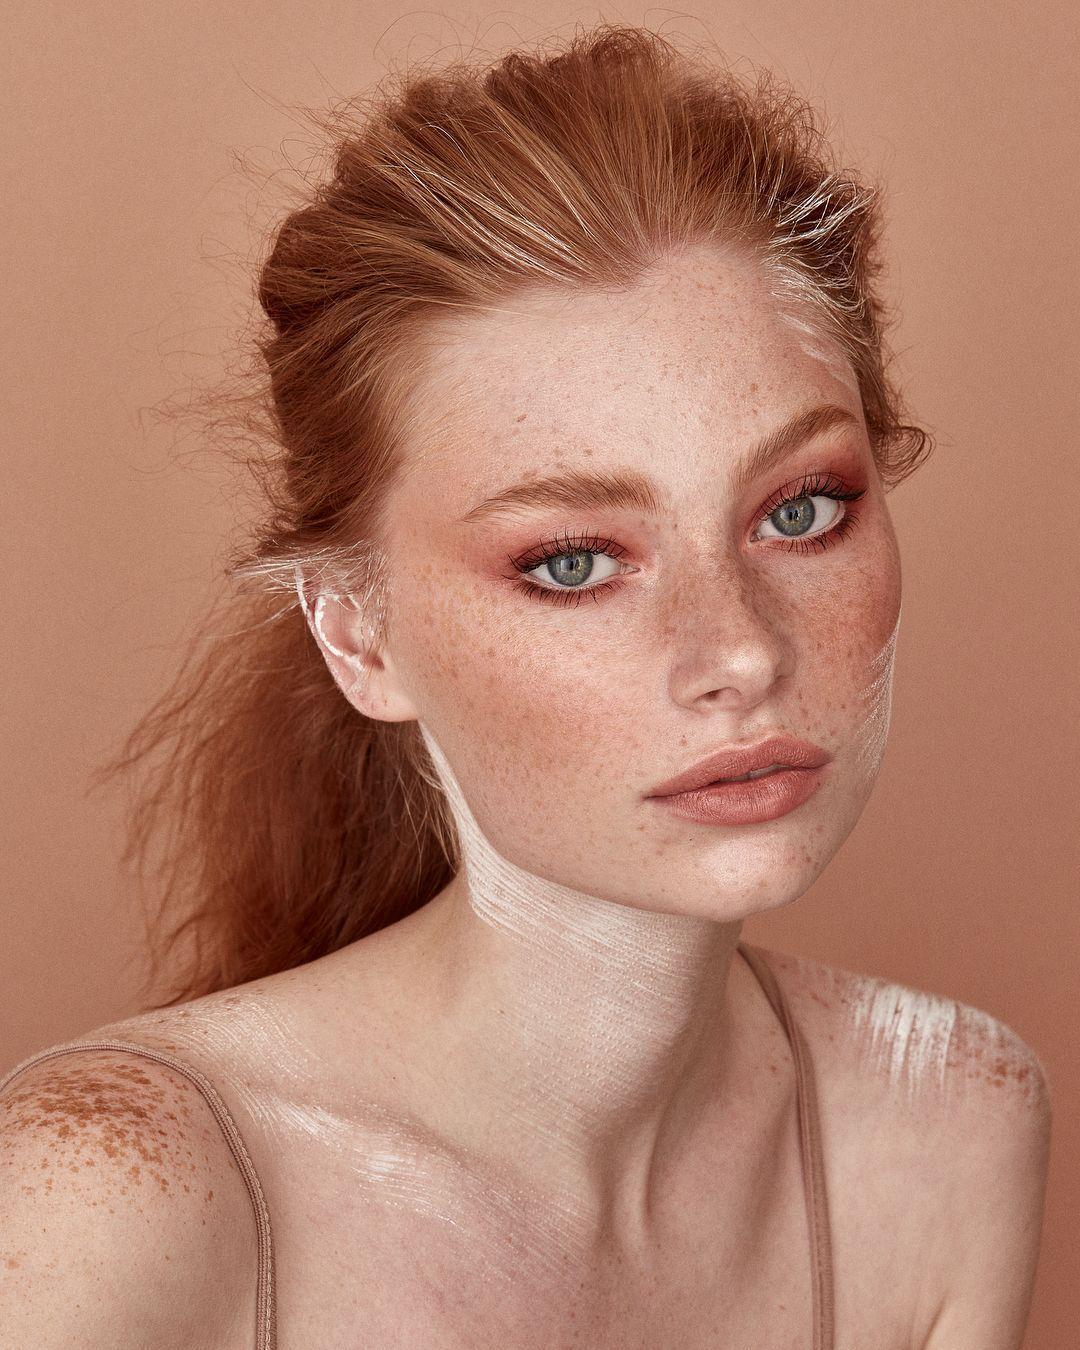 Redhead makeup, Freckles makeup, Freckles girl, Natural